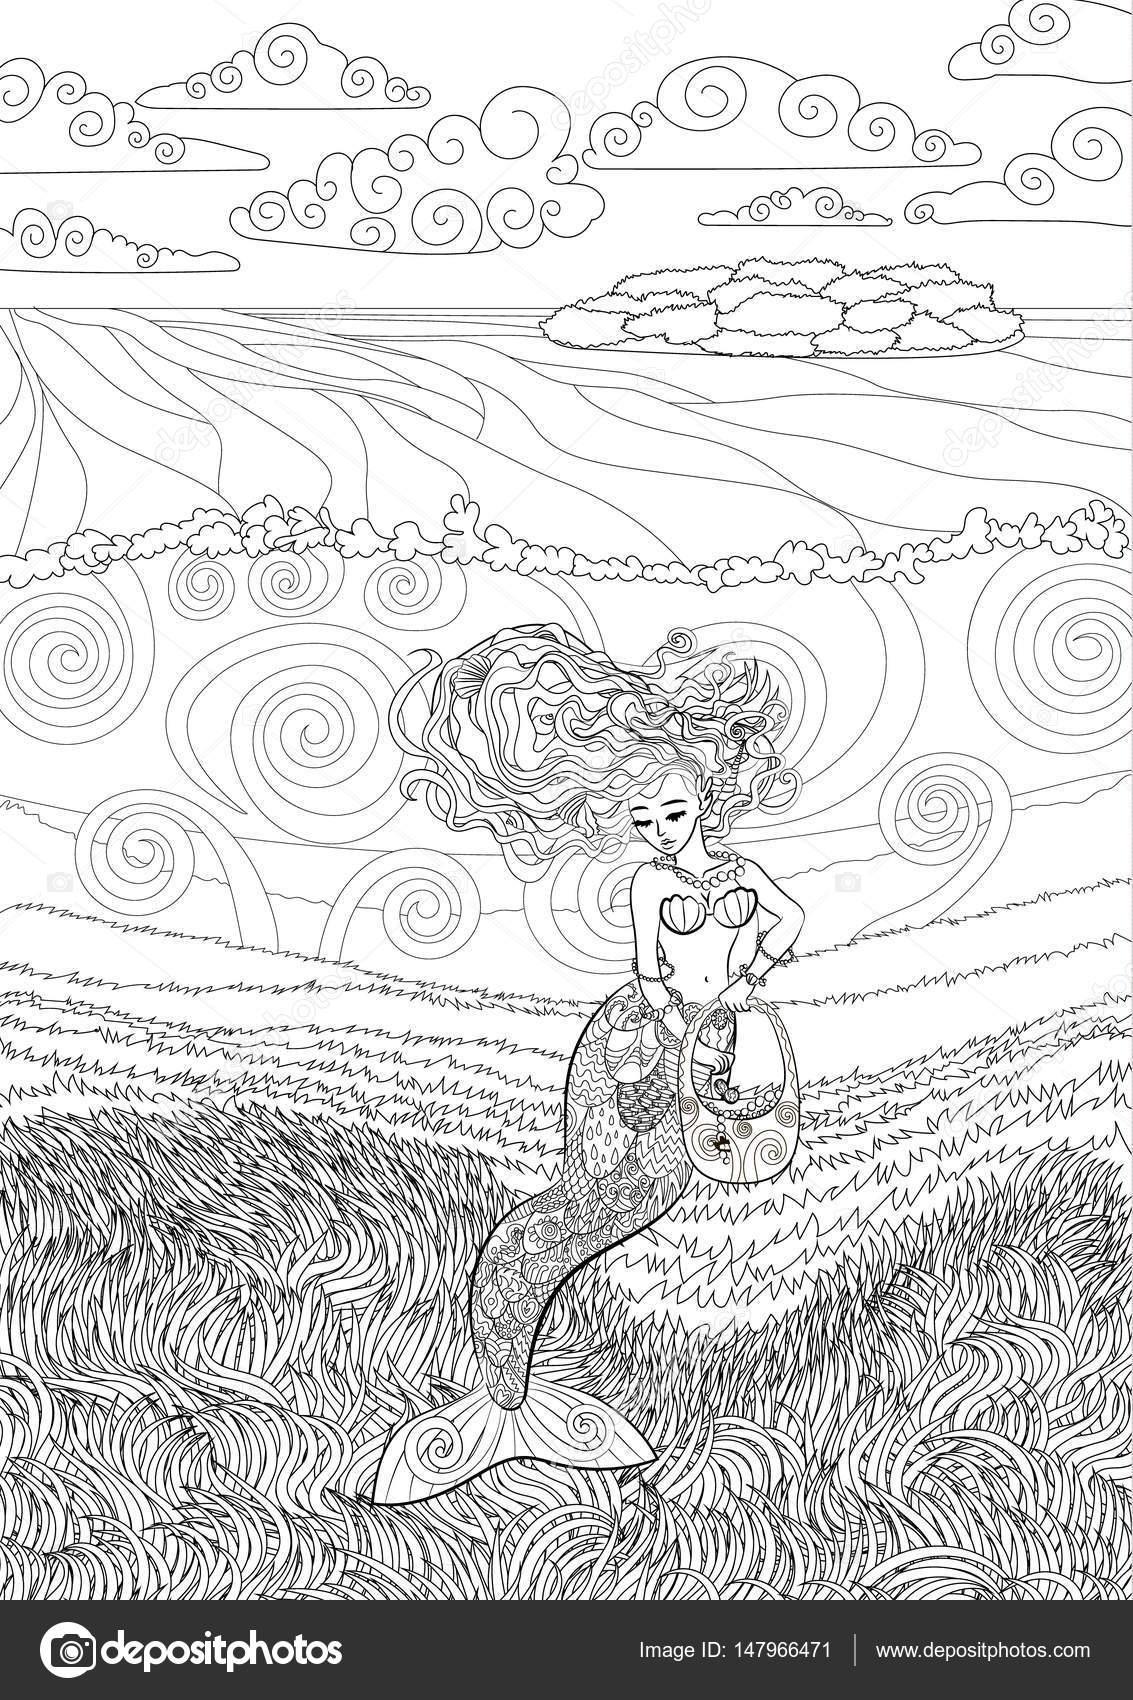 Gemusterte Abbildung Einer Meerjungfrau Stockvektor